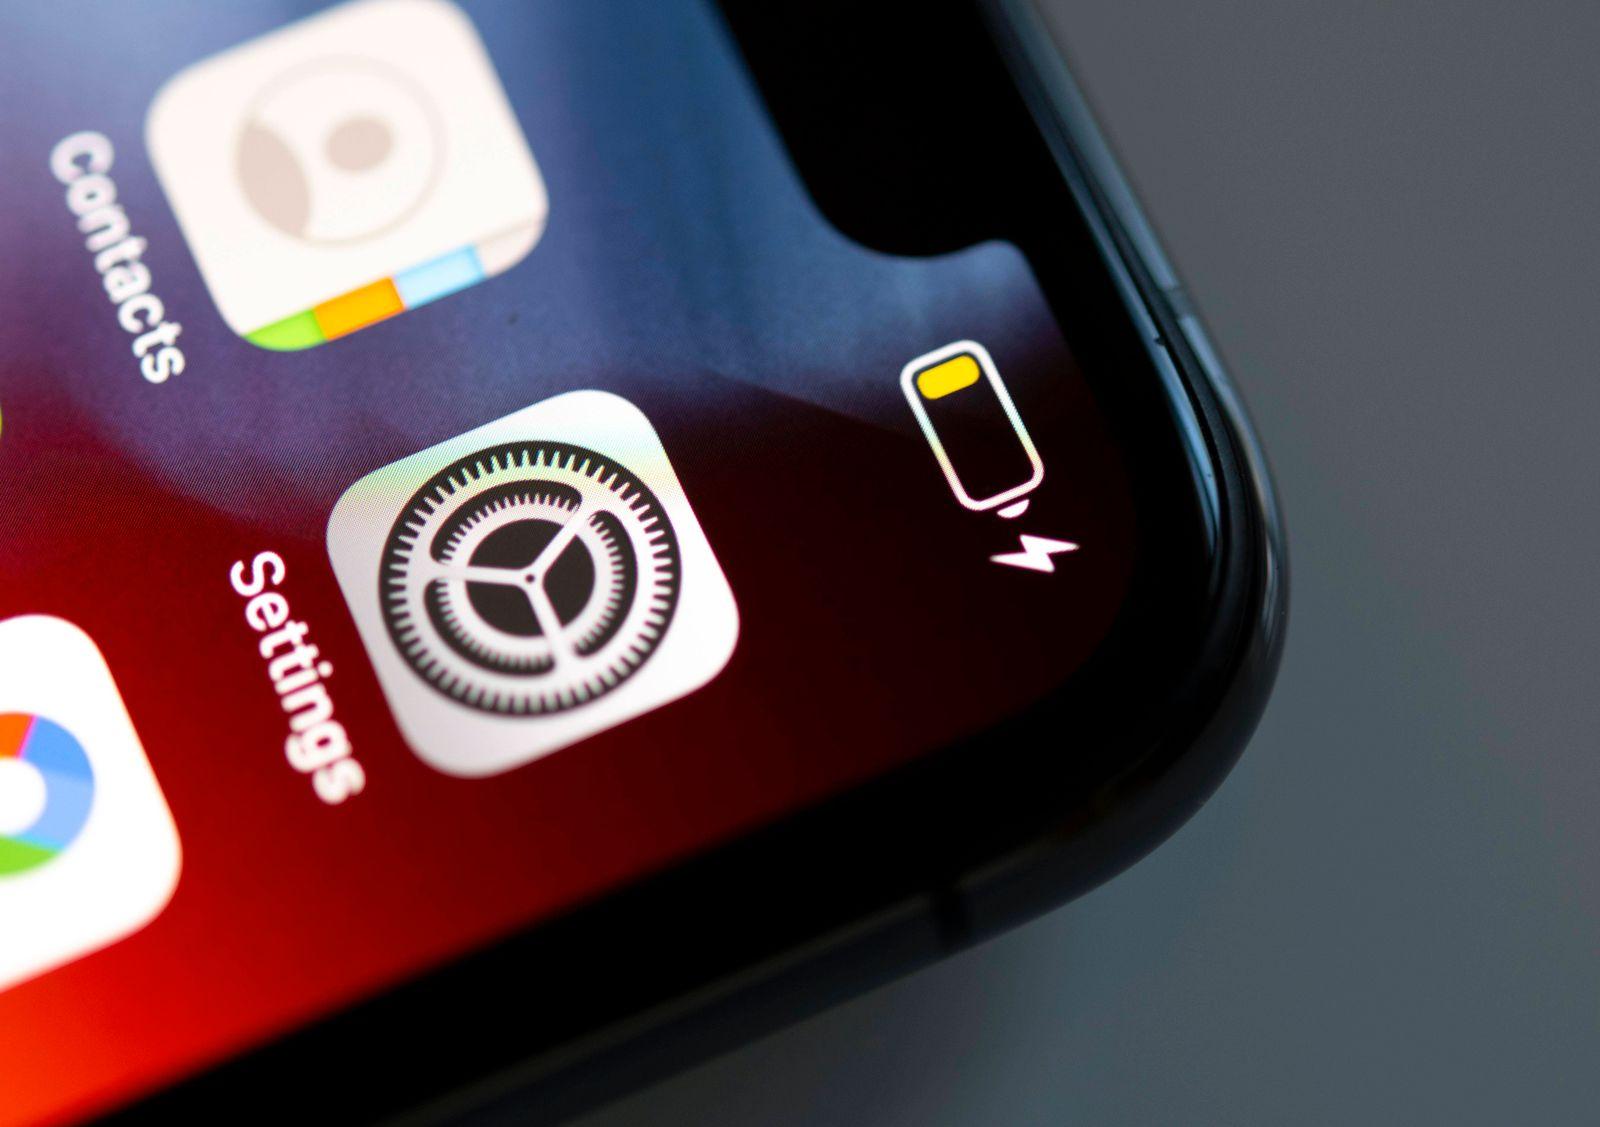 Akku leer, Batterieanzeige, Batterie, iPhone, iOS, Smartphone, Display, Nahaufnahme, Detail *** battery empty, battery i